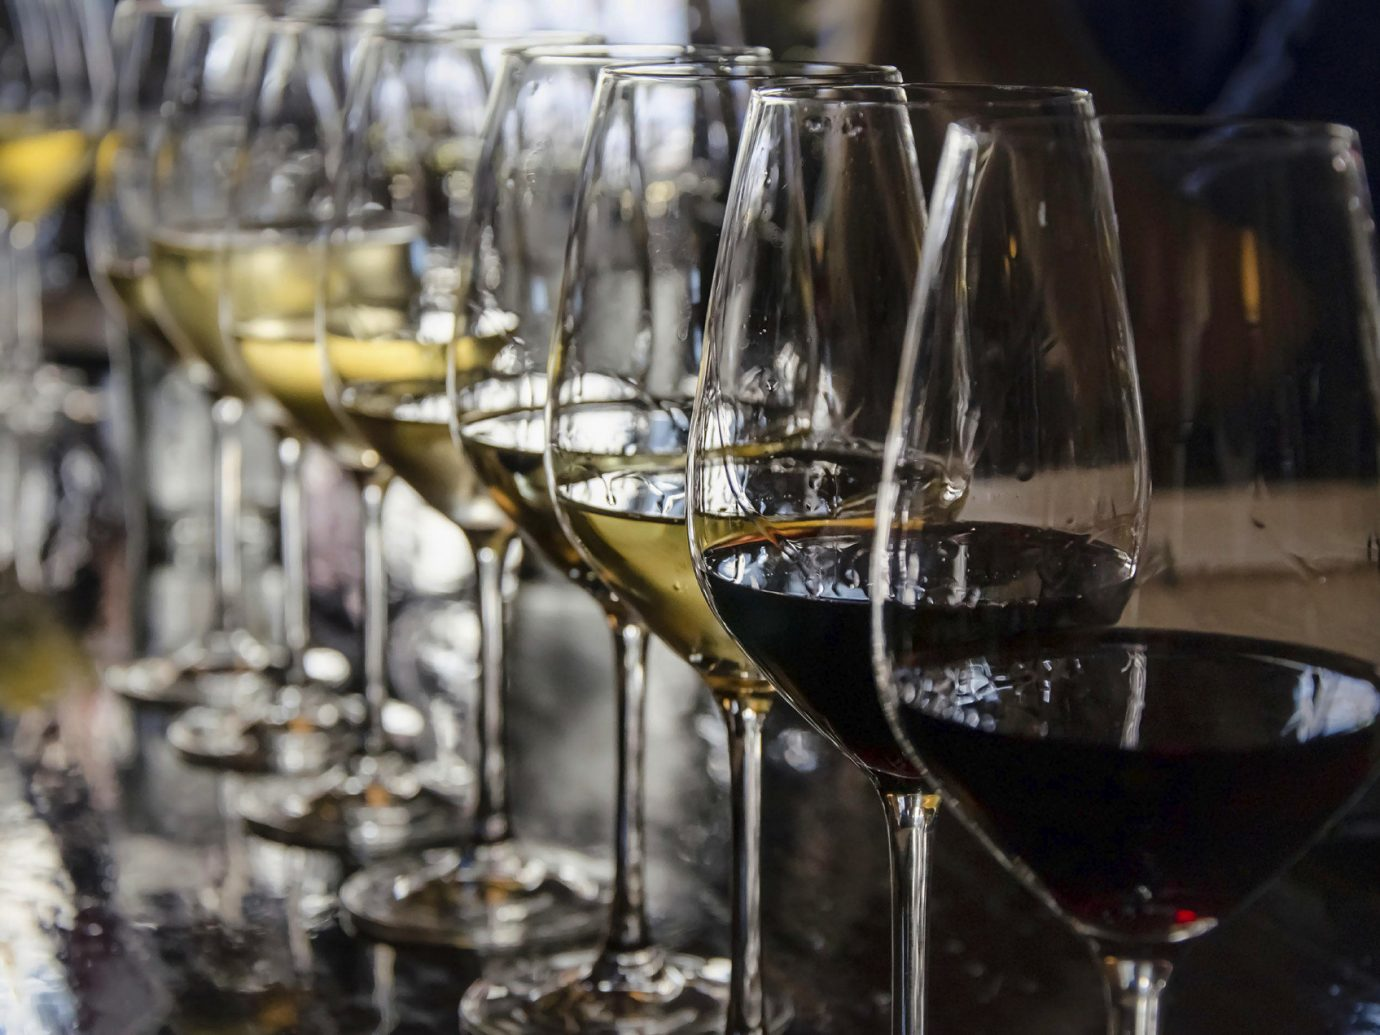 Food + Drink wine indoor alcoholic beverage Drink glass container distilled beverage restaurant alcohol